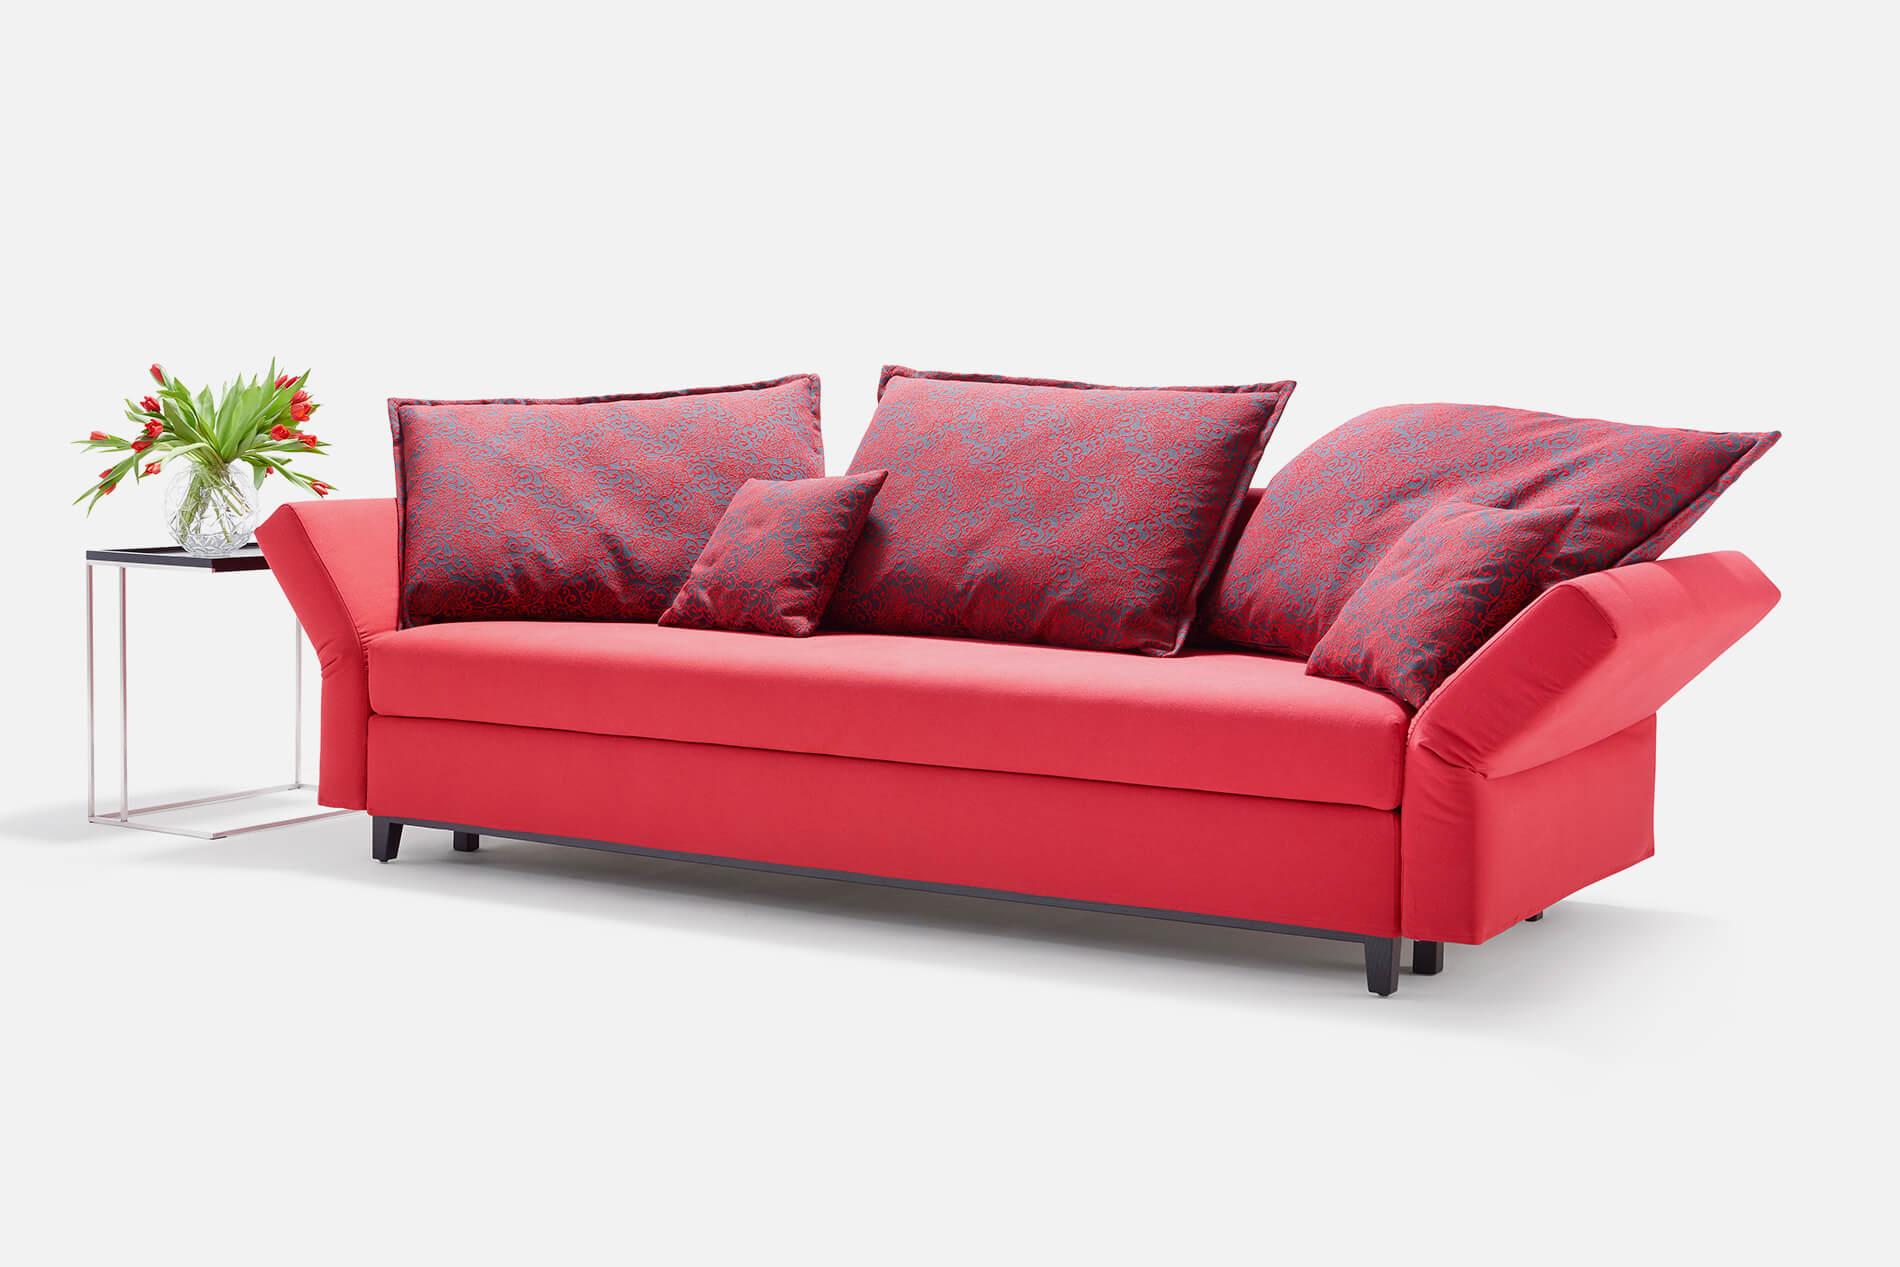 Full Size of Goodlife Sofa Good Life Signet Malaysia Love Amazon Furniture Couch Mit Relaxfunktion Elektrisch Home Affaire Verkaufen Bezug Chesterfield Leder Flexform Sofa Goodlife Sofa